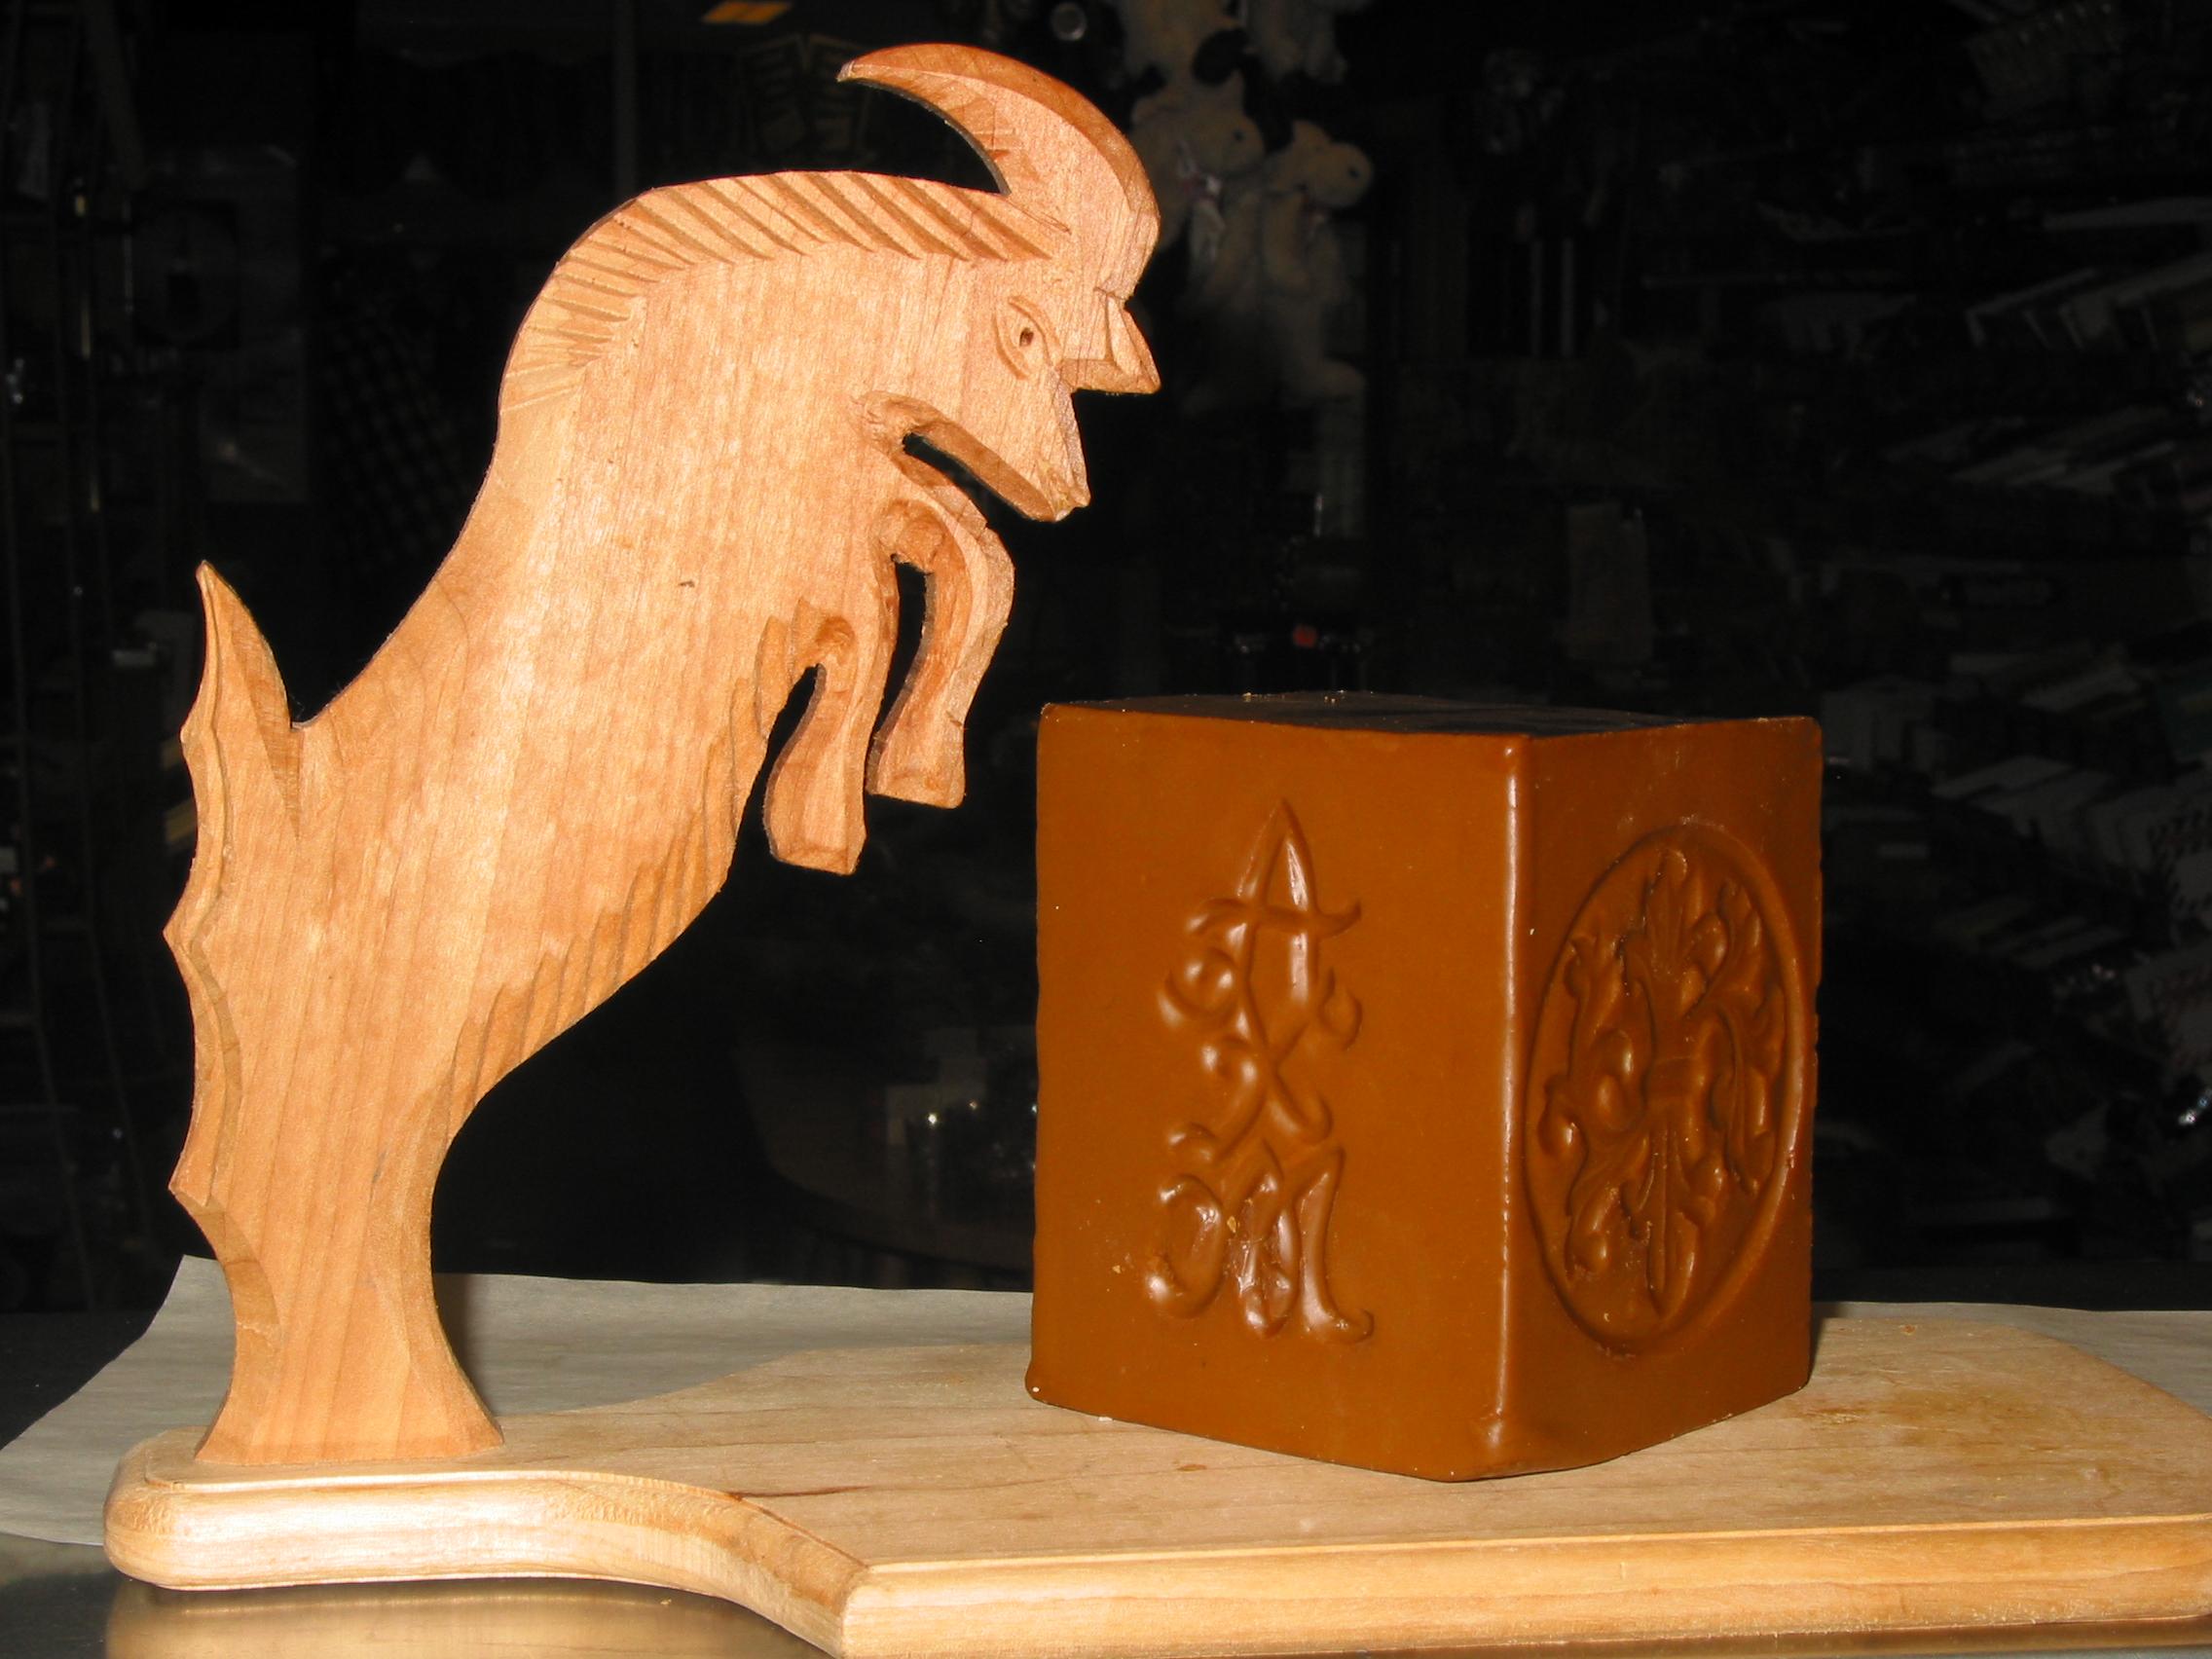 geitost-brown-cheese-sogneford-norway-sweet-presidium